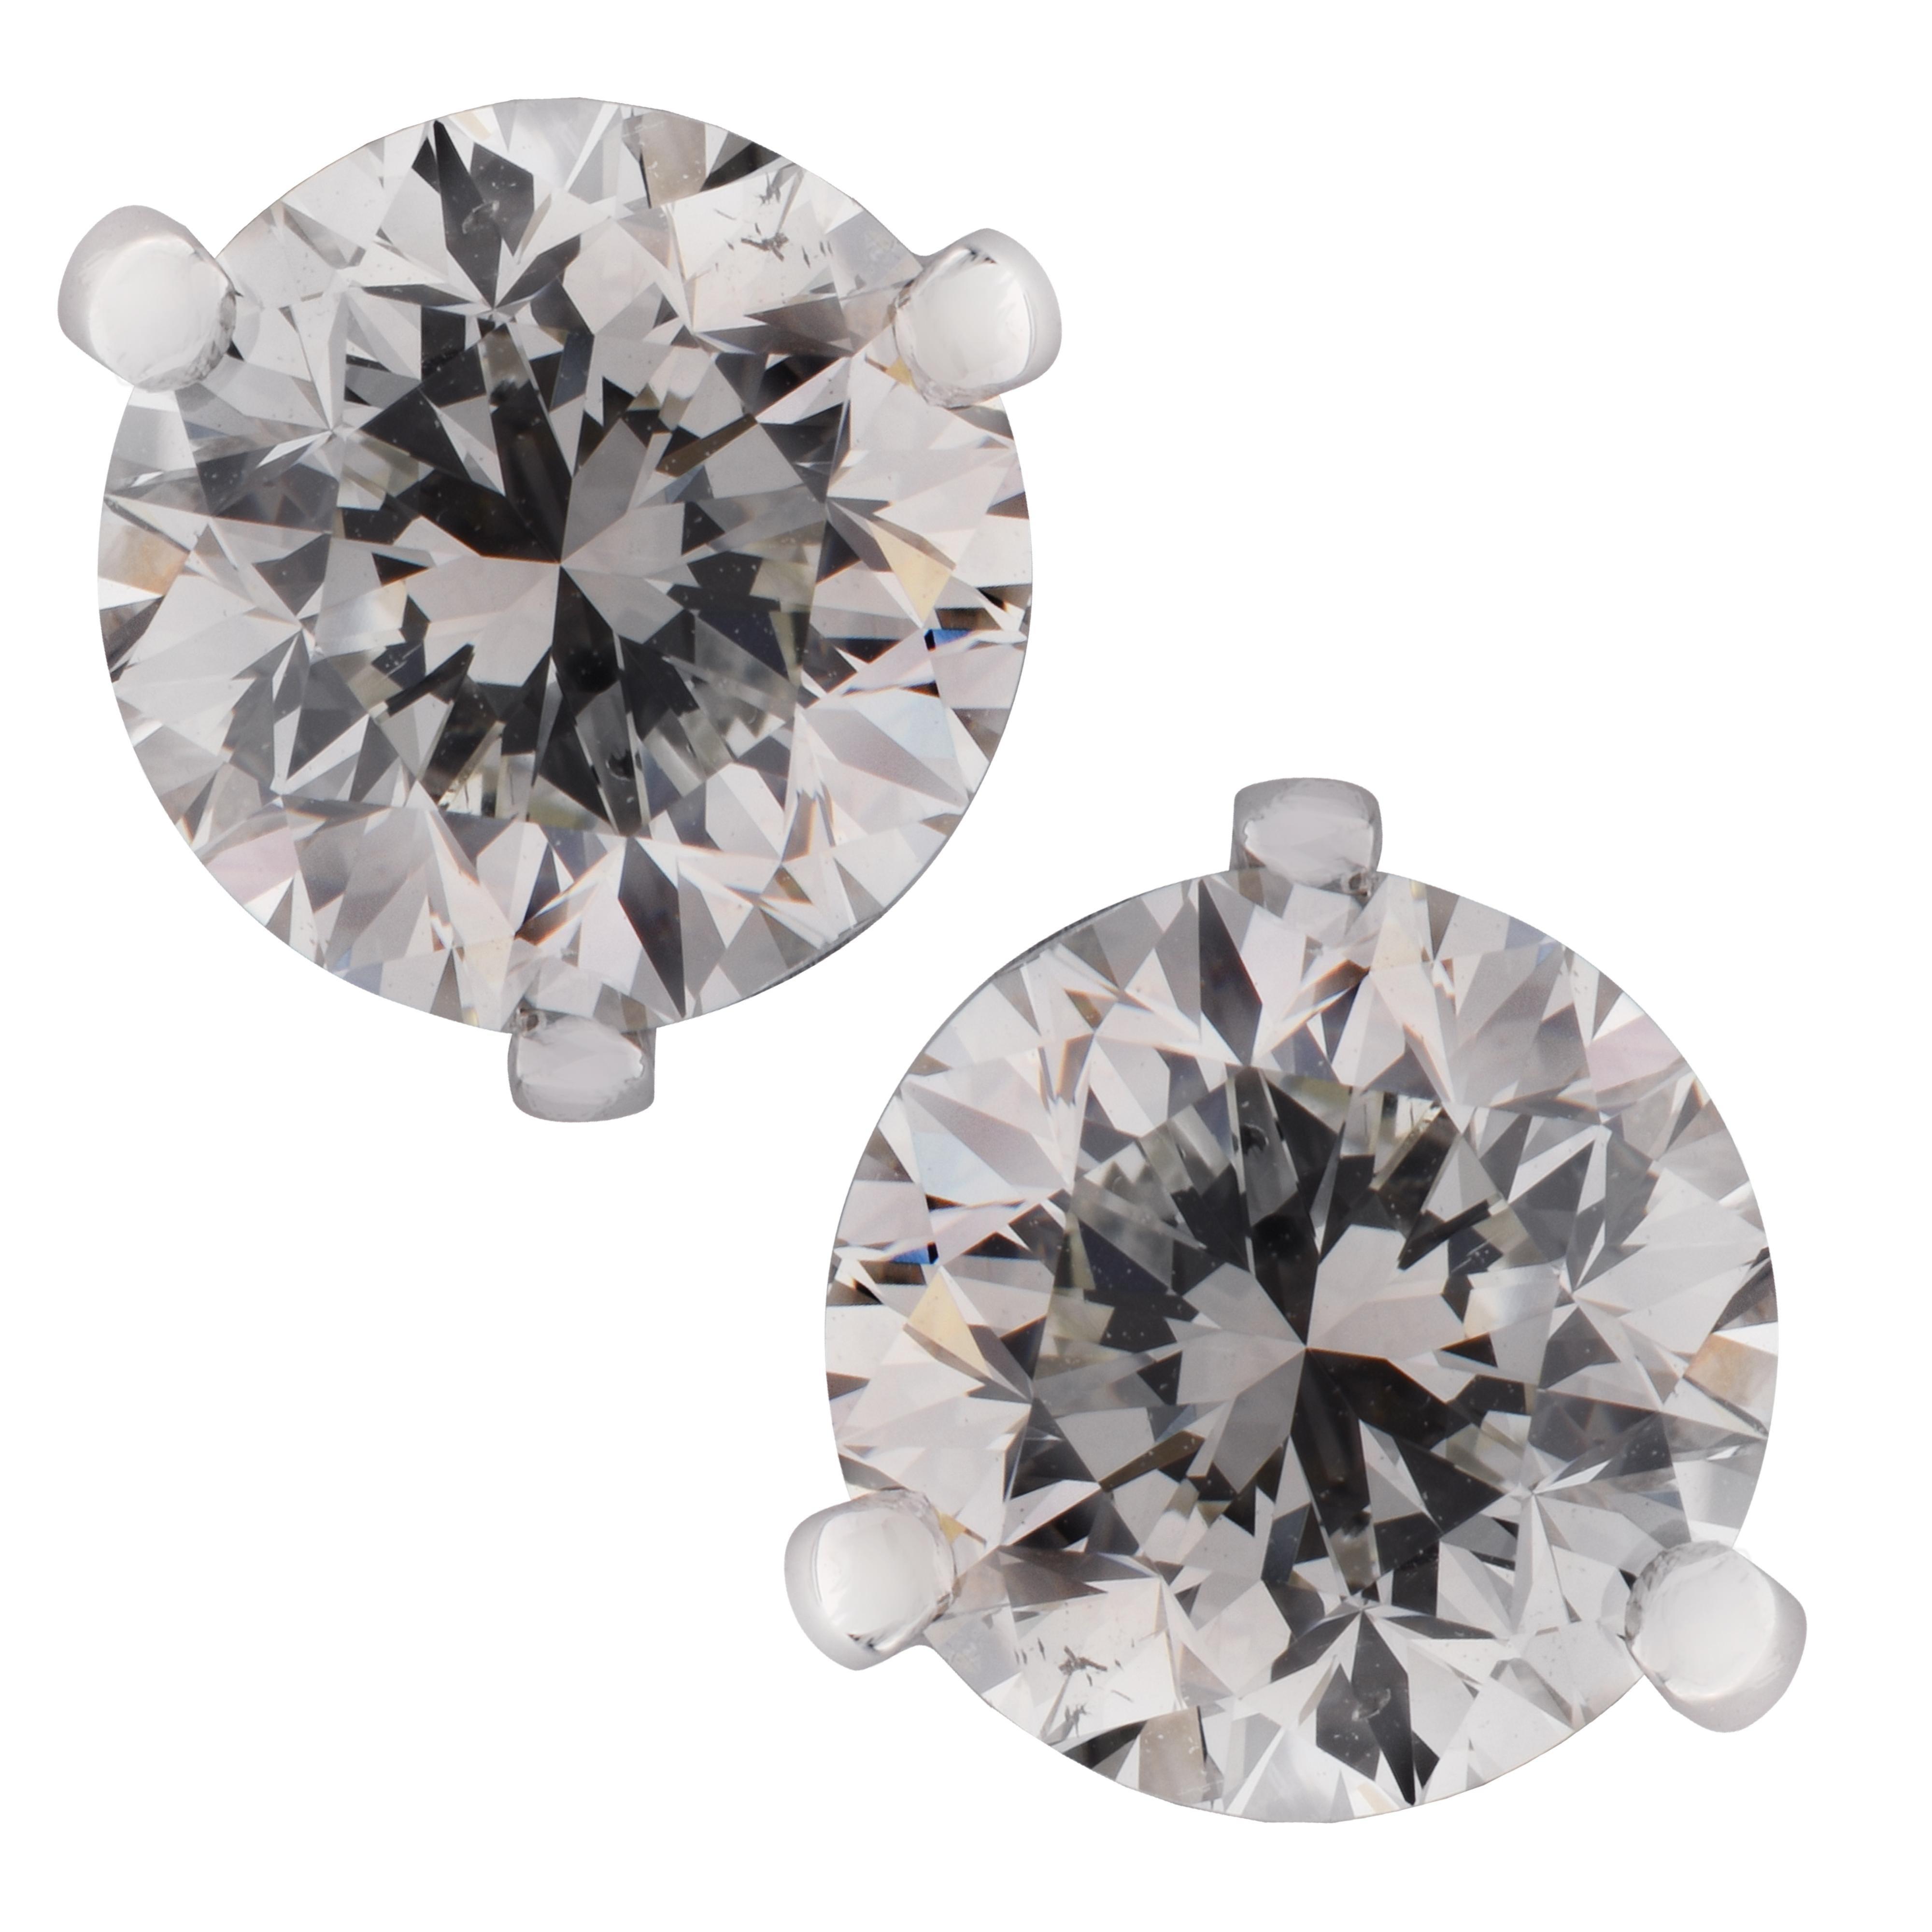 Vivid Diamonds GIA Certified 2.93 Carat Diamond Stud Earrings